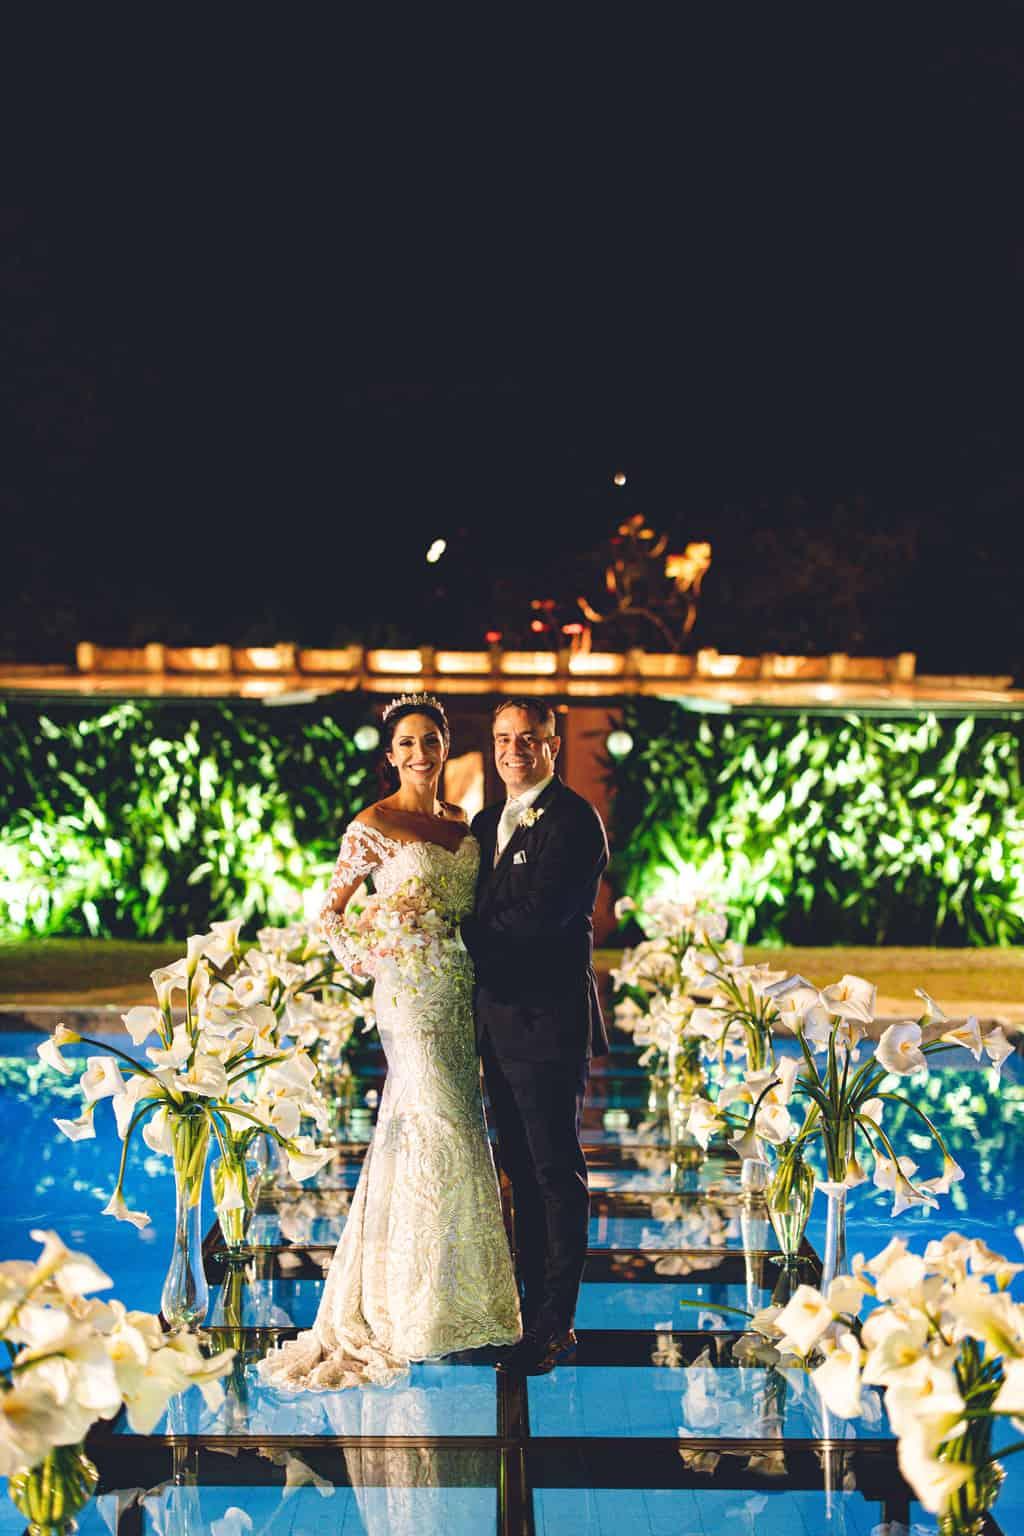 Casamento-de-Bianka-e-Nilo-Fotografia-Marcelo-Schmoeller-SC-Alameda-Casa-Rosa-03082019_bianka-e-nilo_2203